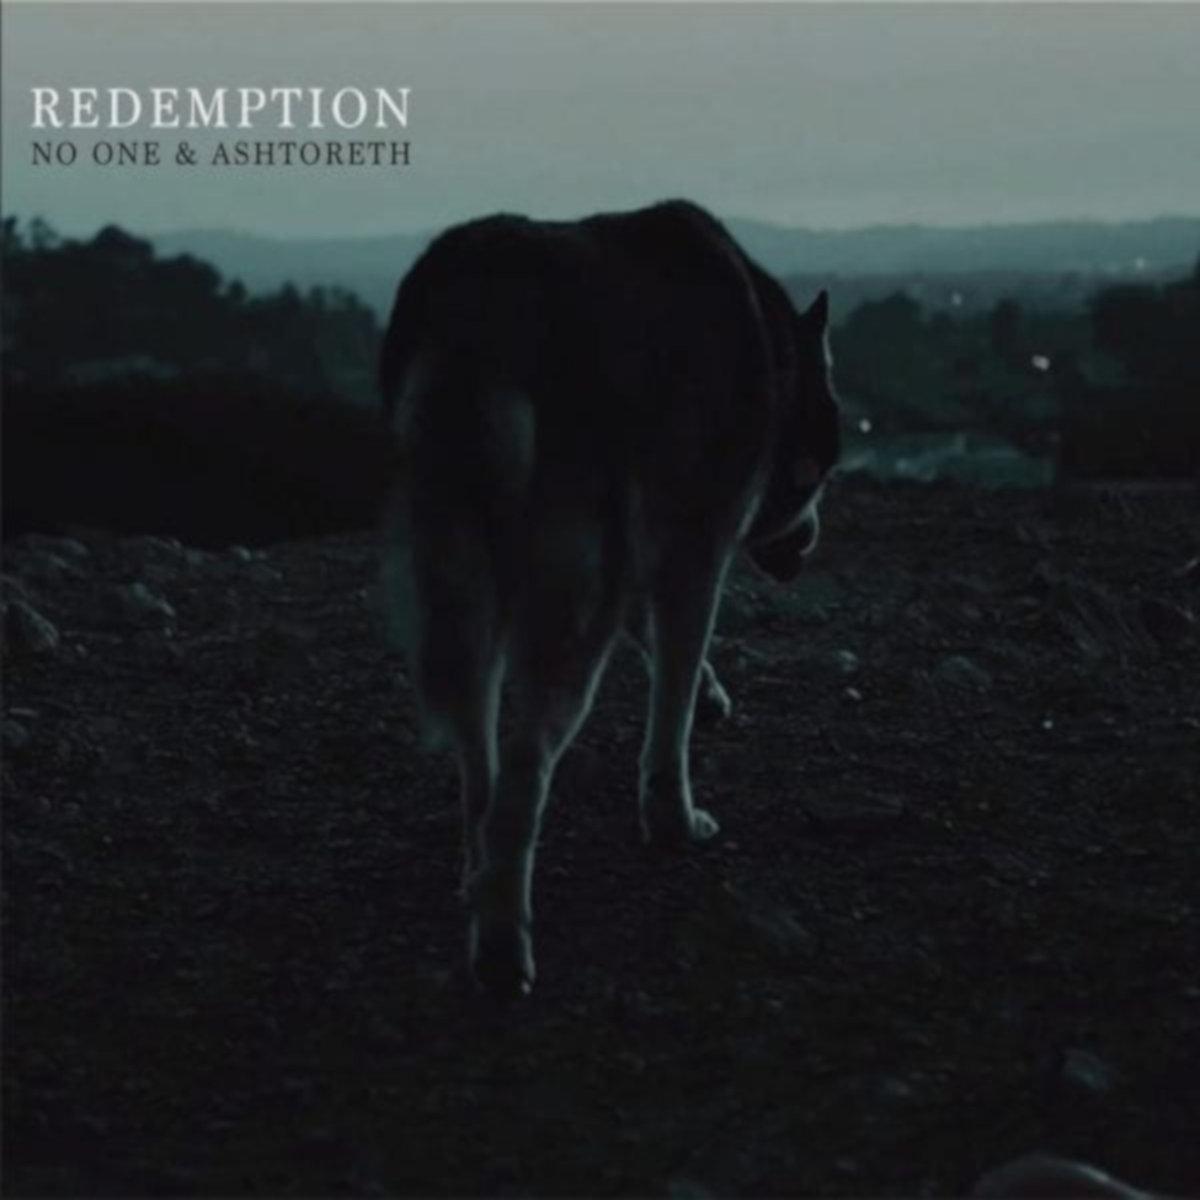 Redemption by Ashtoreth + No One